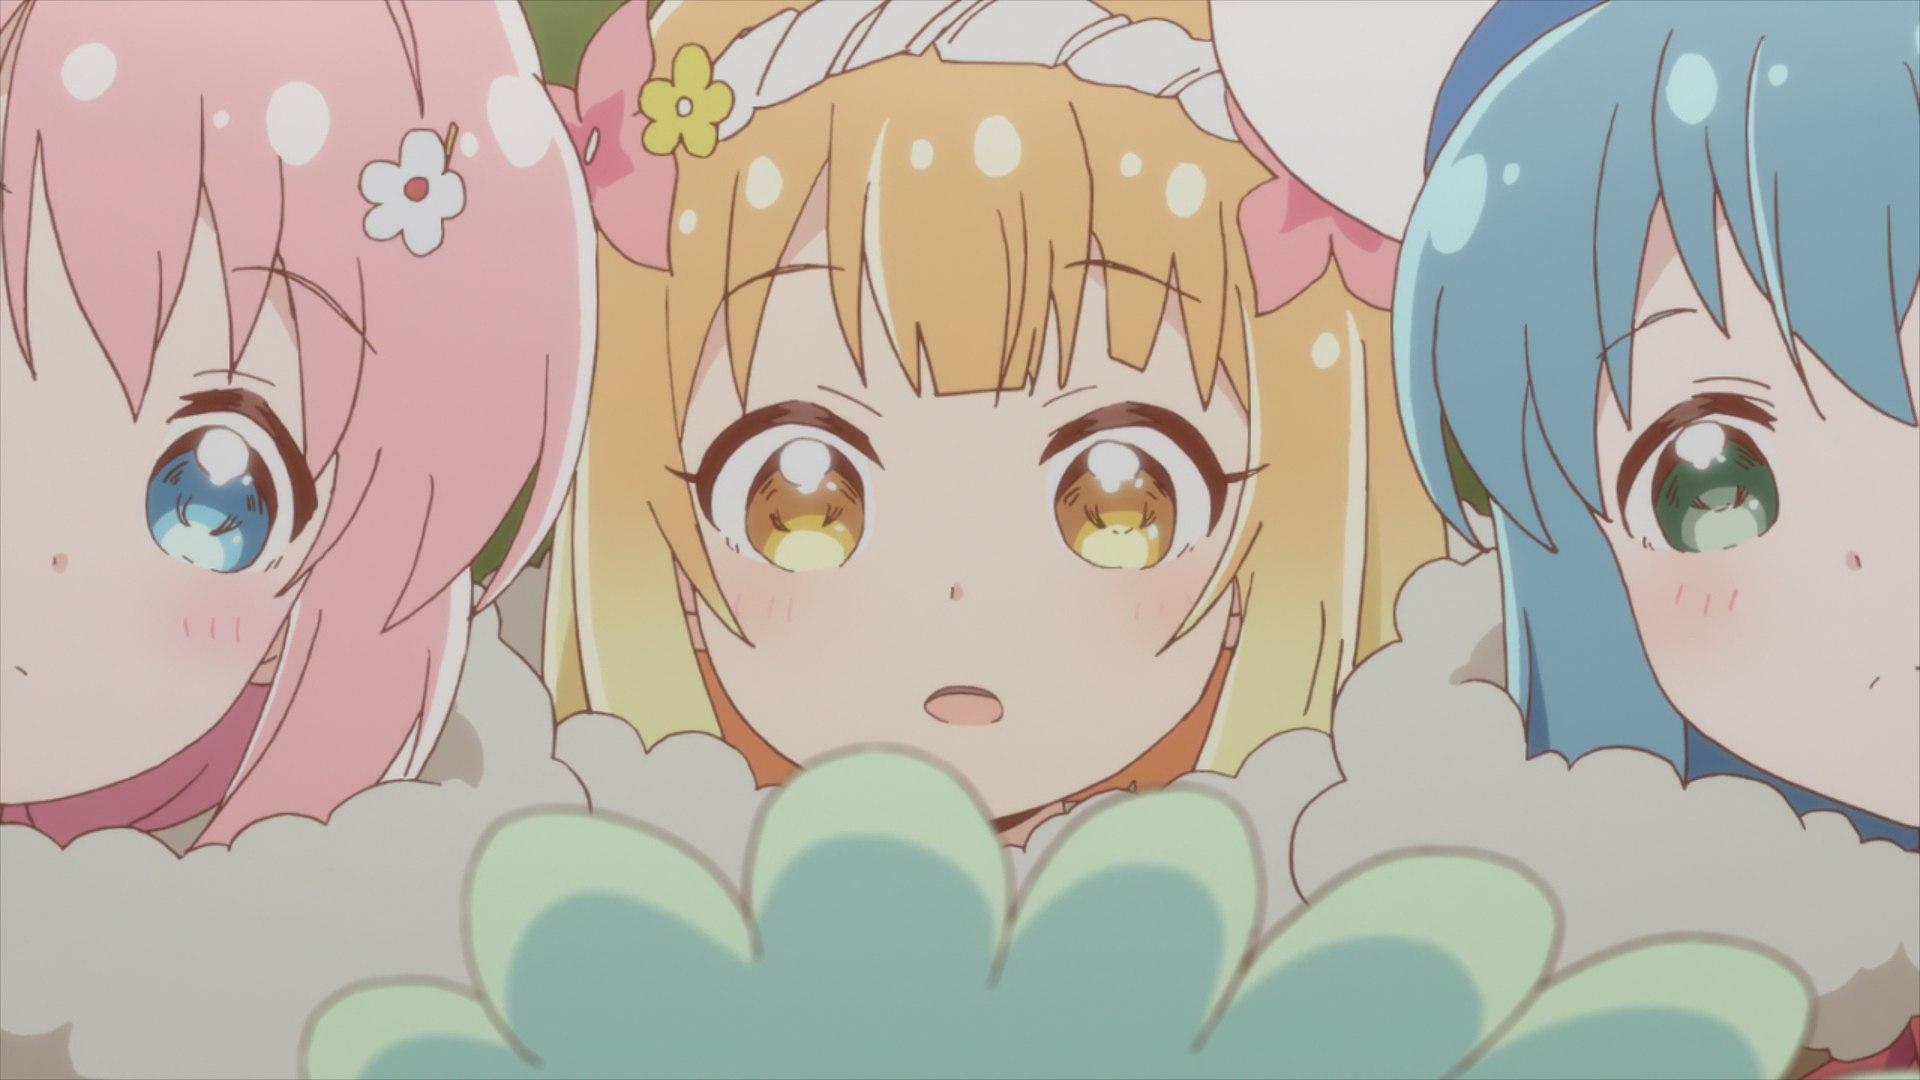 Endro! - Podsumowanie roku anime 2019 - rascal.pl